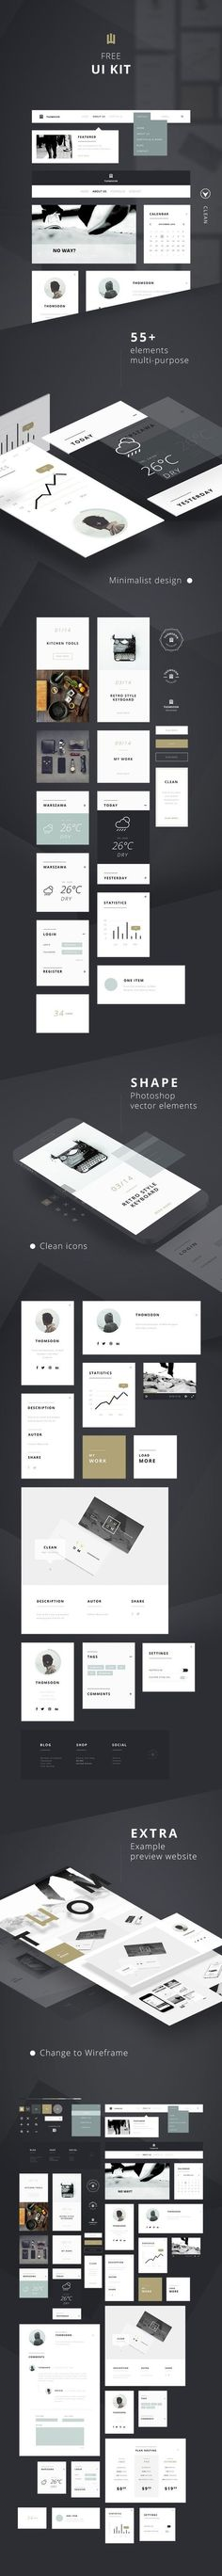 (1) UI Design - Tapiture